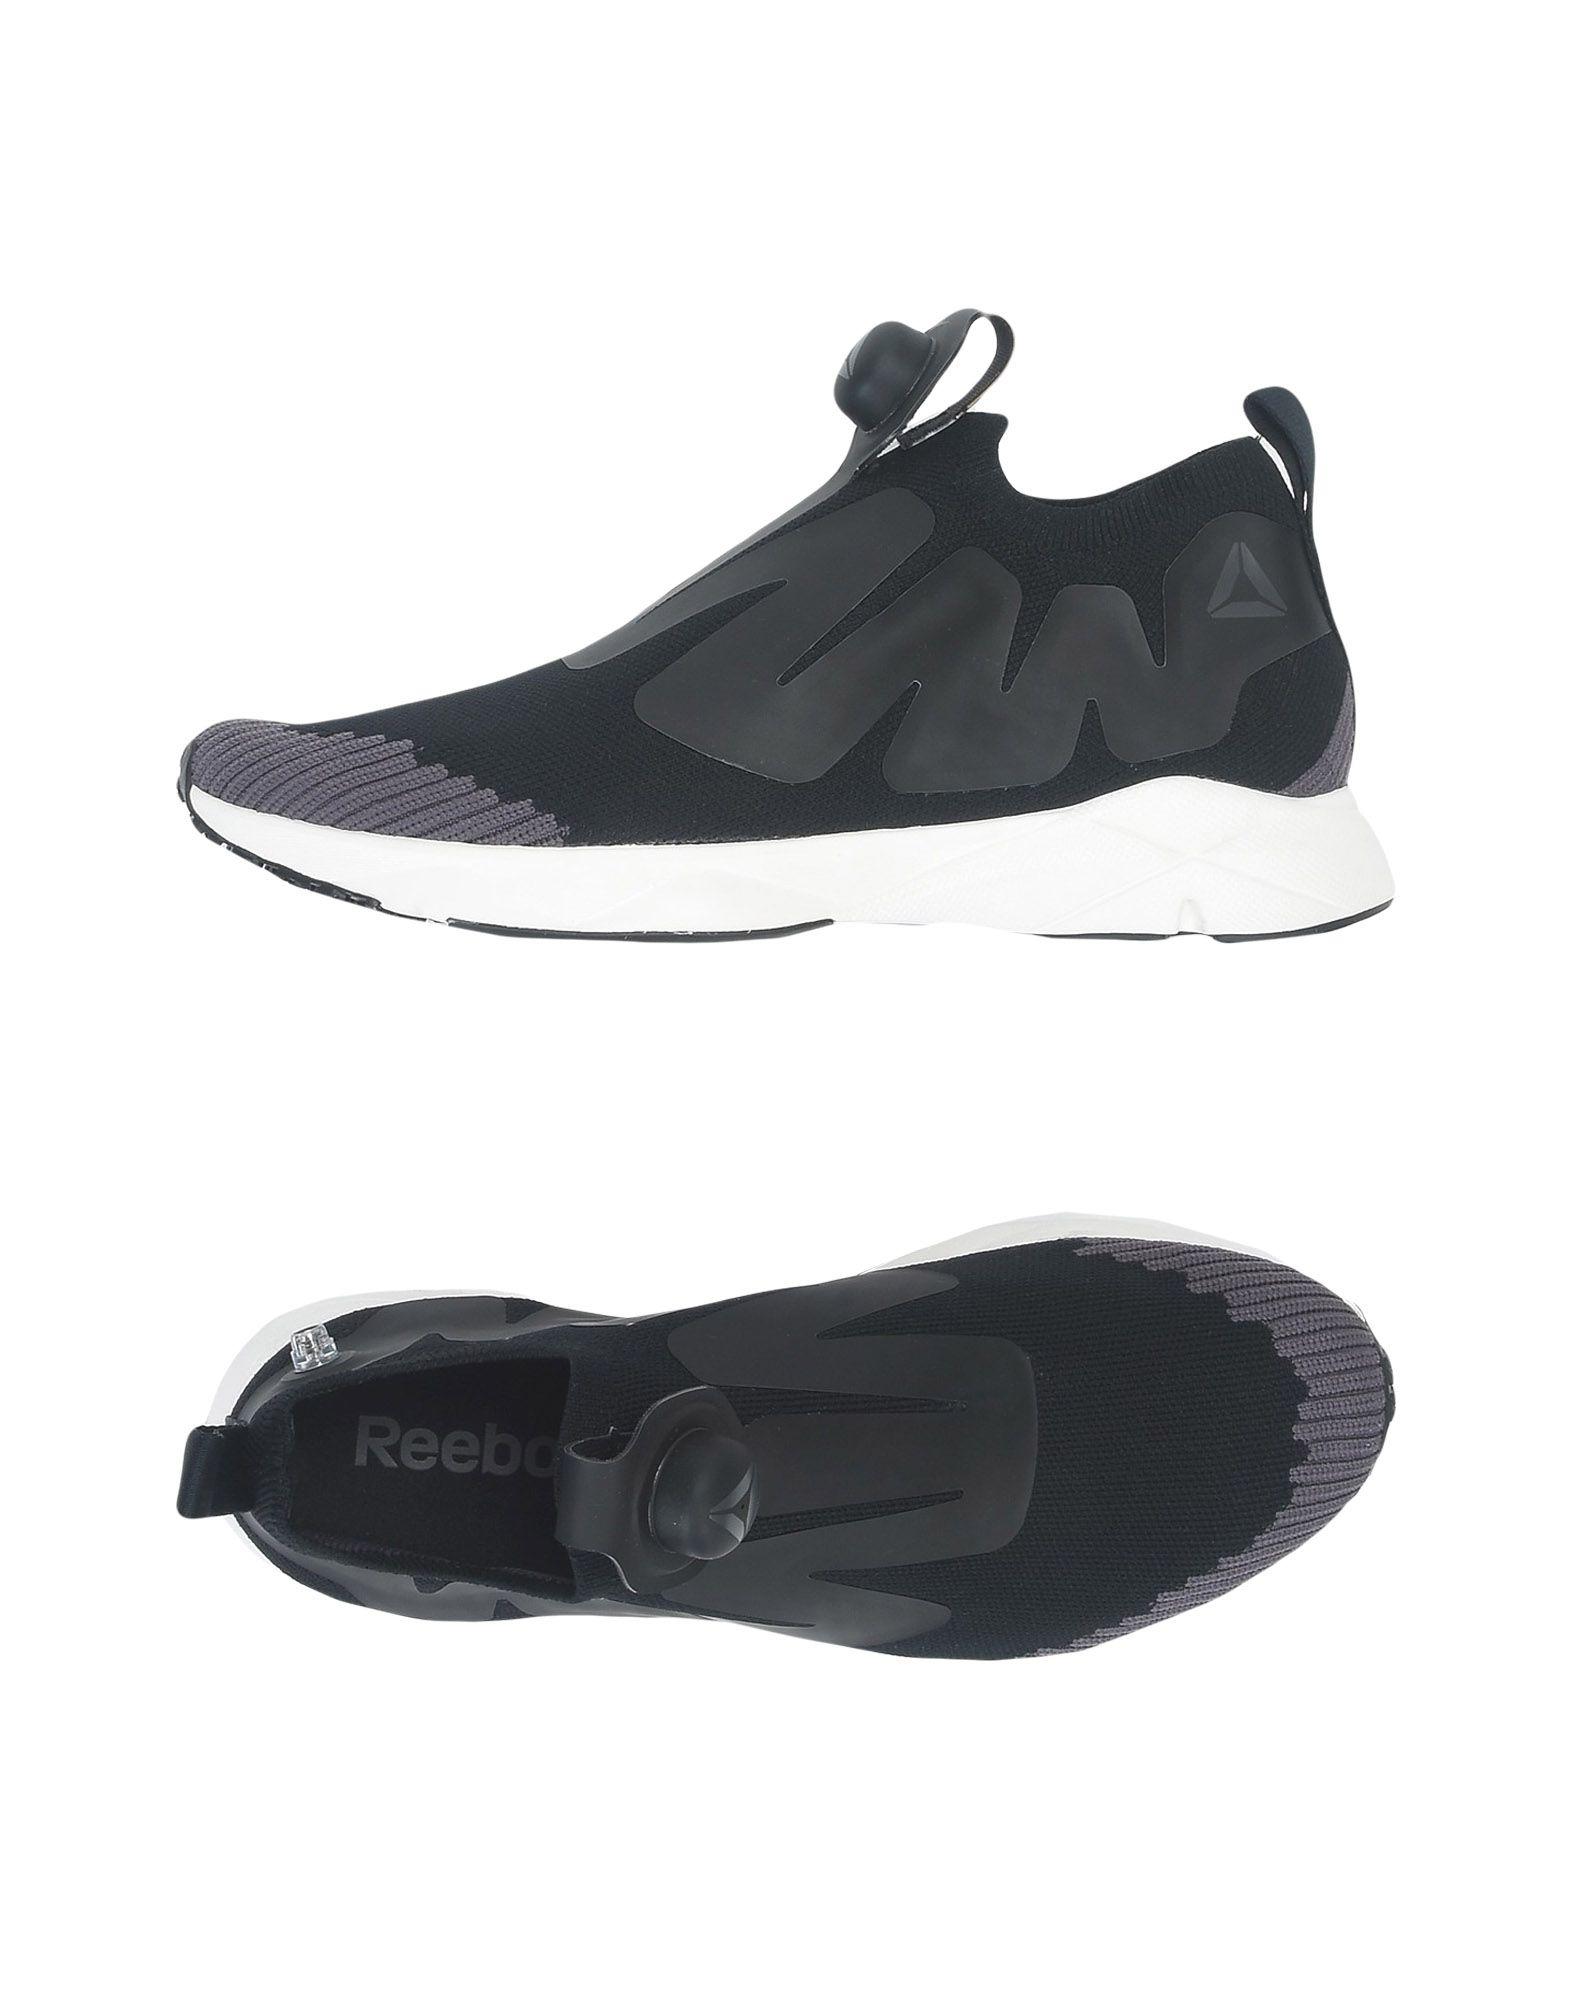 Sneakers Reebok Reebok Pump Supreme - Donna - 11495271MD